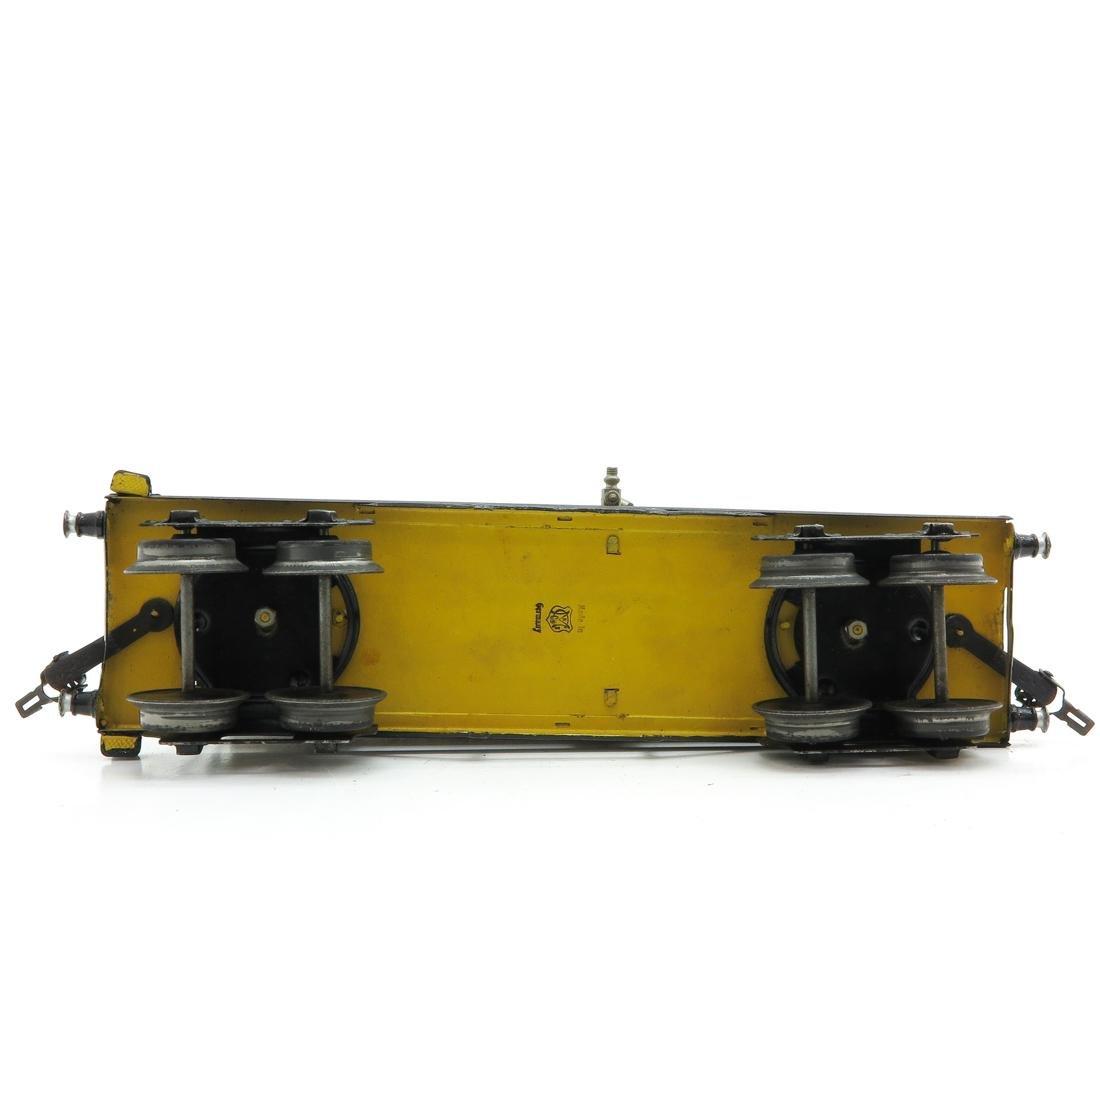 Vintage Marklin Shell Tanker - 6